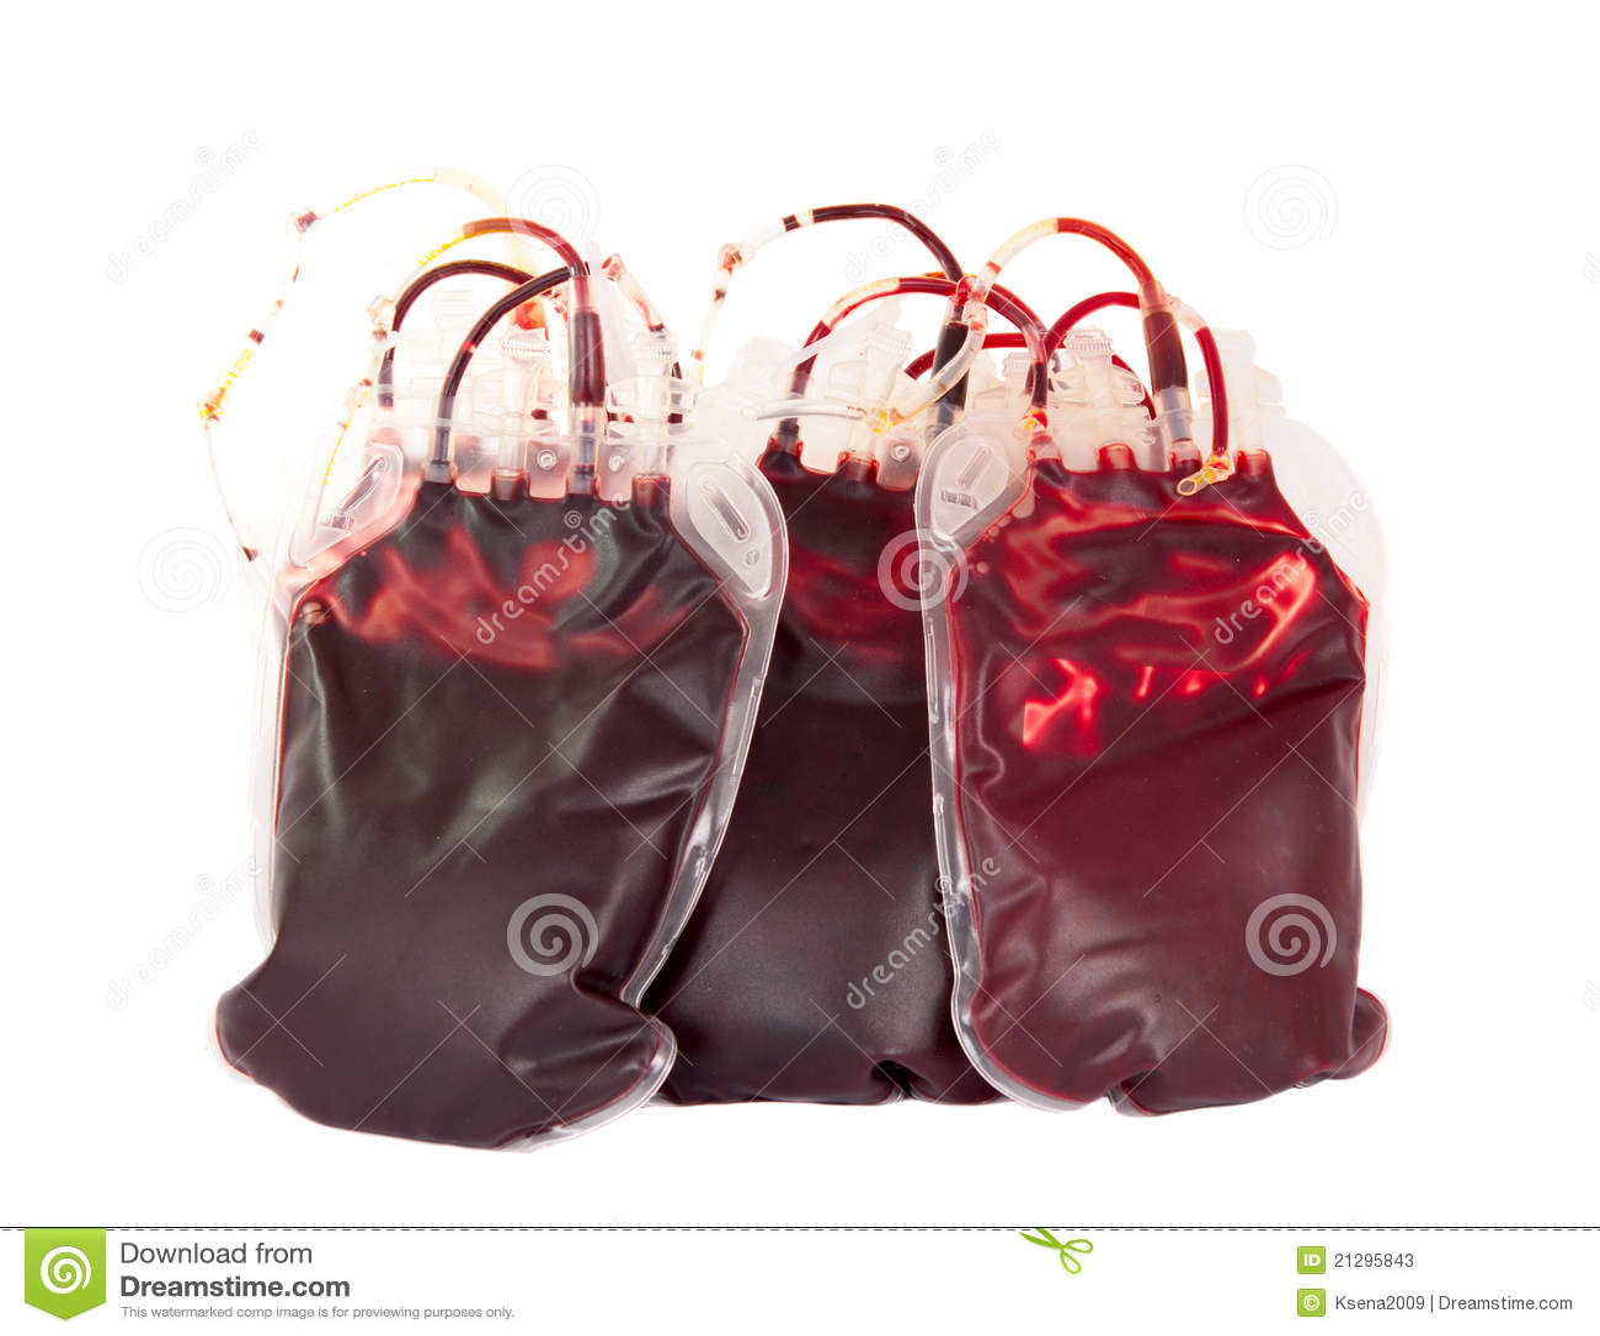 Blood banking and transfusion medicine